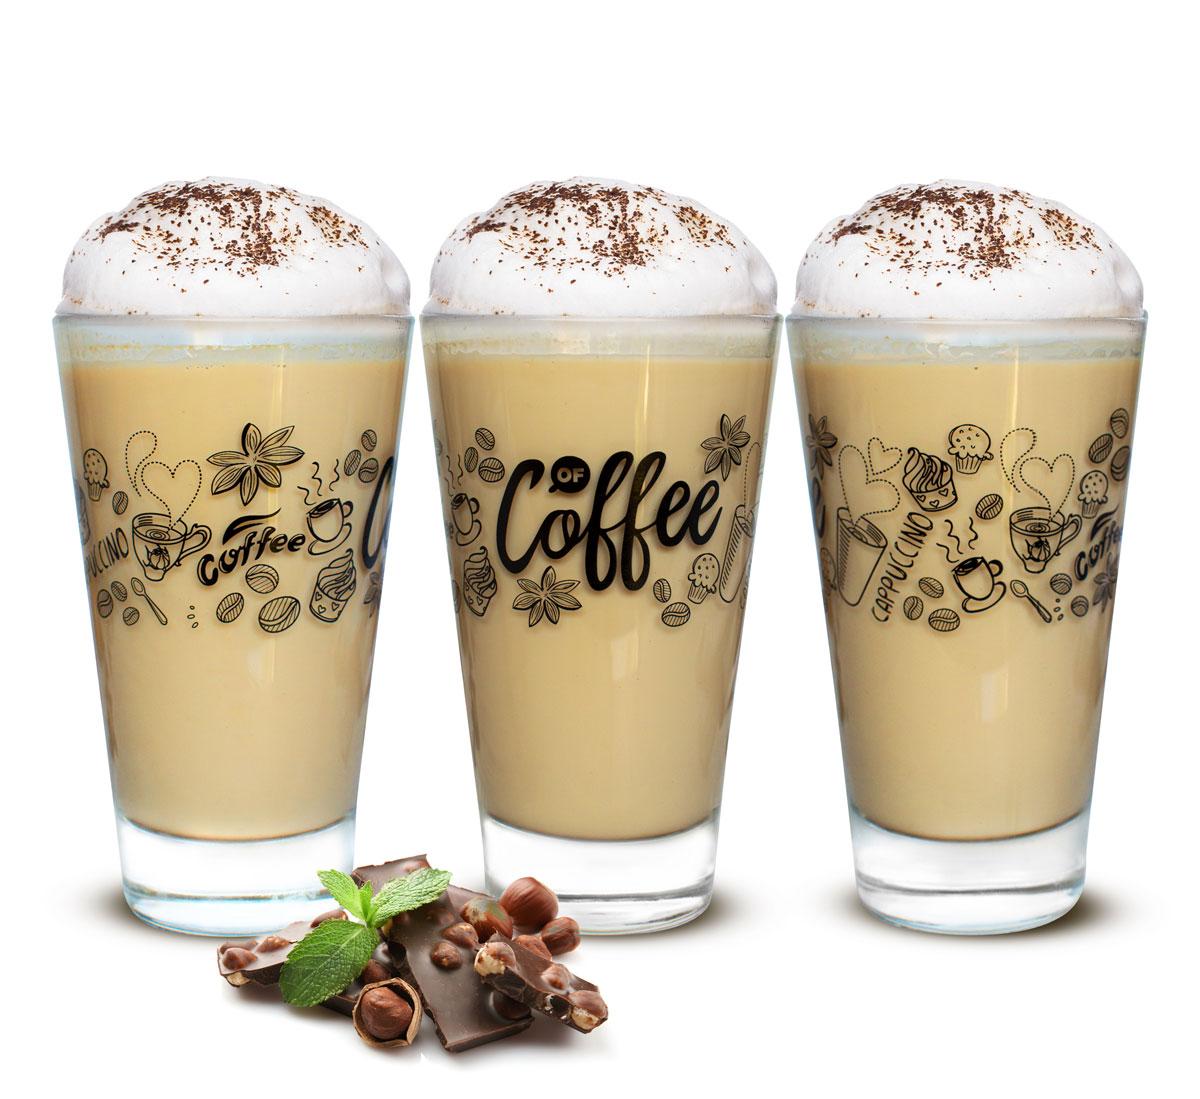 6 latte macchiato gl ser 310ml kaffeegl ser teegl ser mit schwarzem kaffee motiv ebay. Black Bedroom Furniture Sets. Home Design Ideas